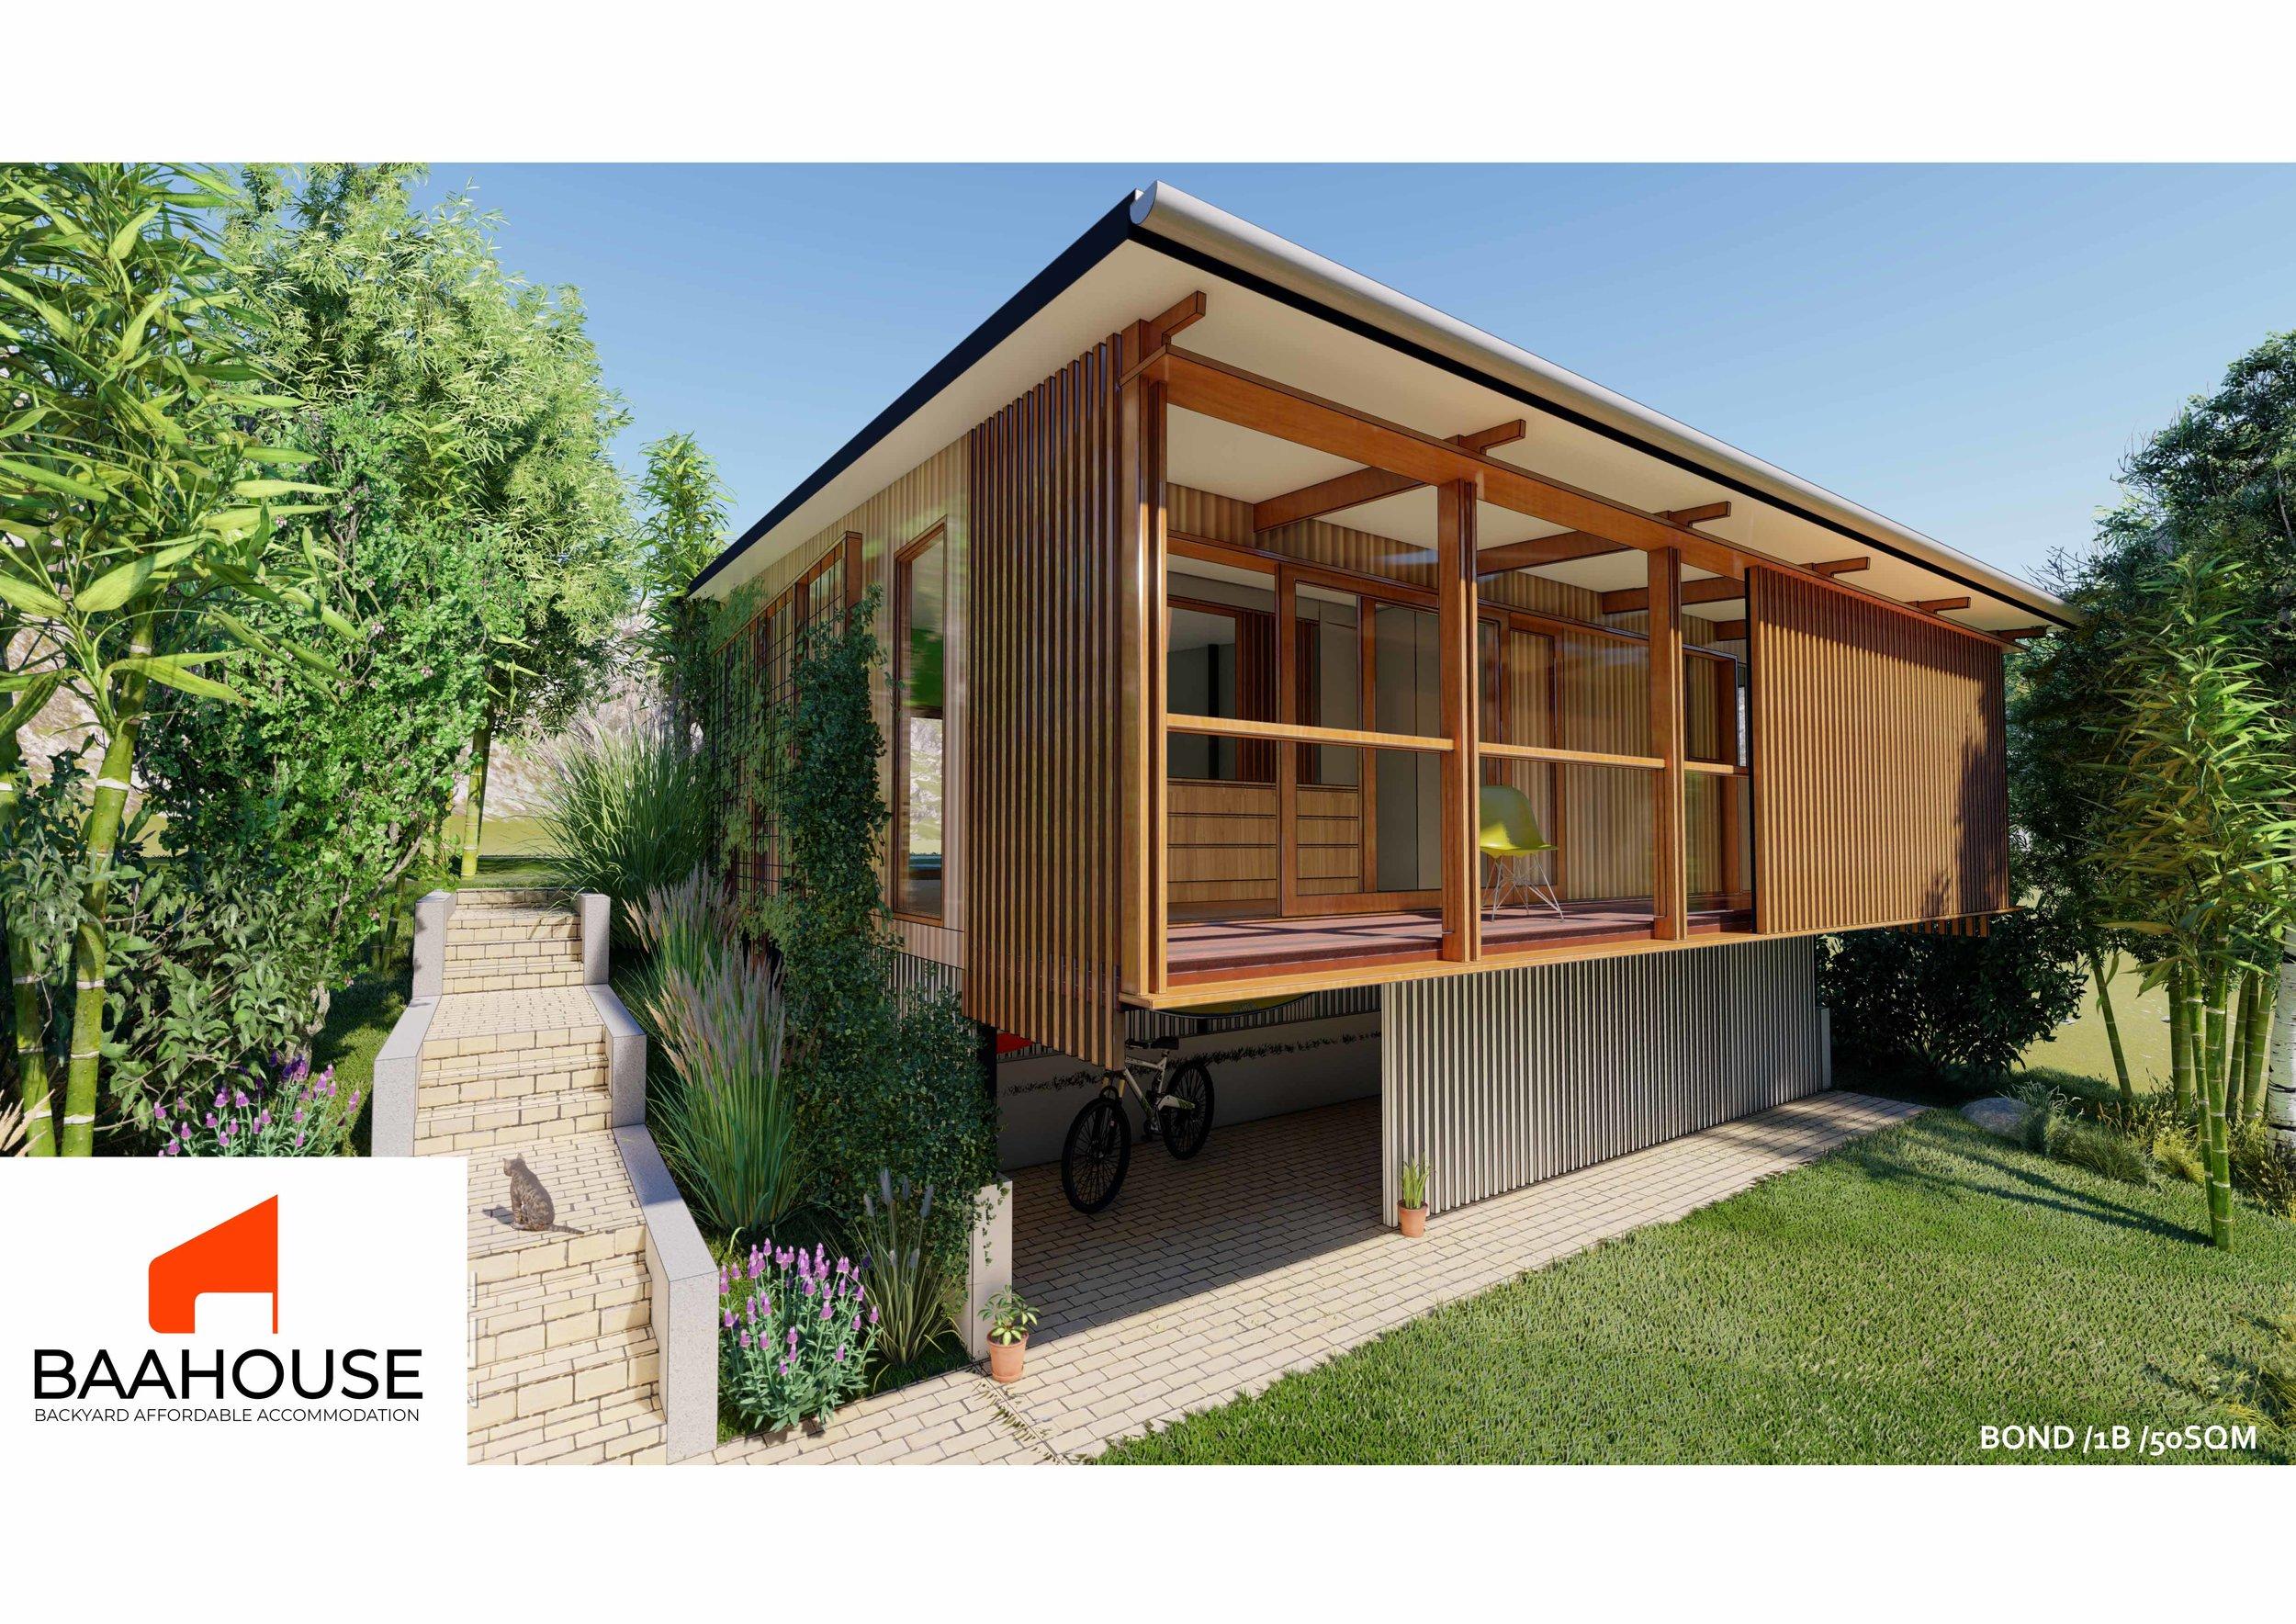 Bond/1B/50sqm — Baahouse / Granny flats / Tiny House / Small houses